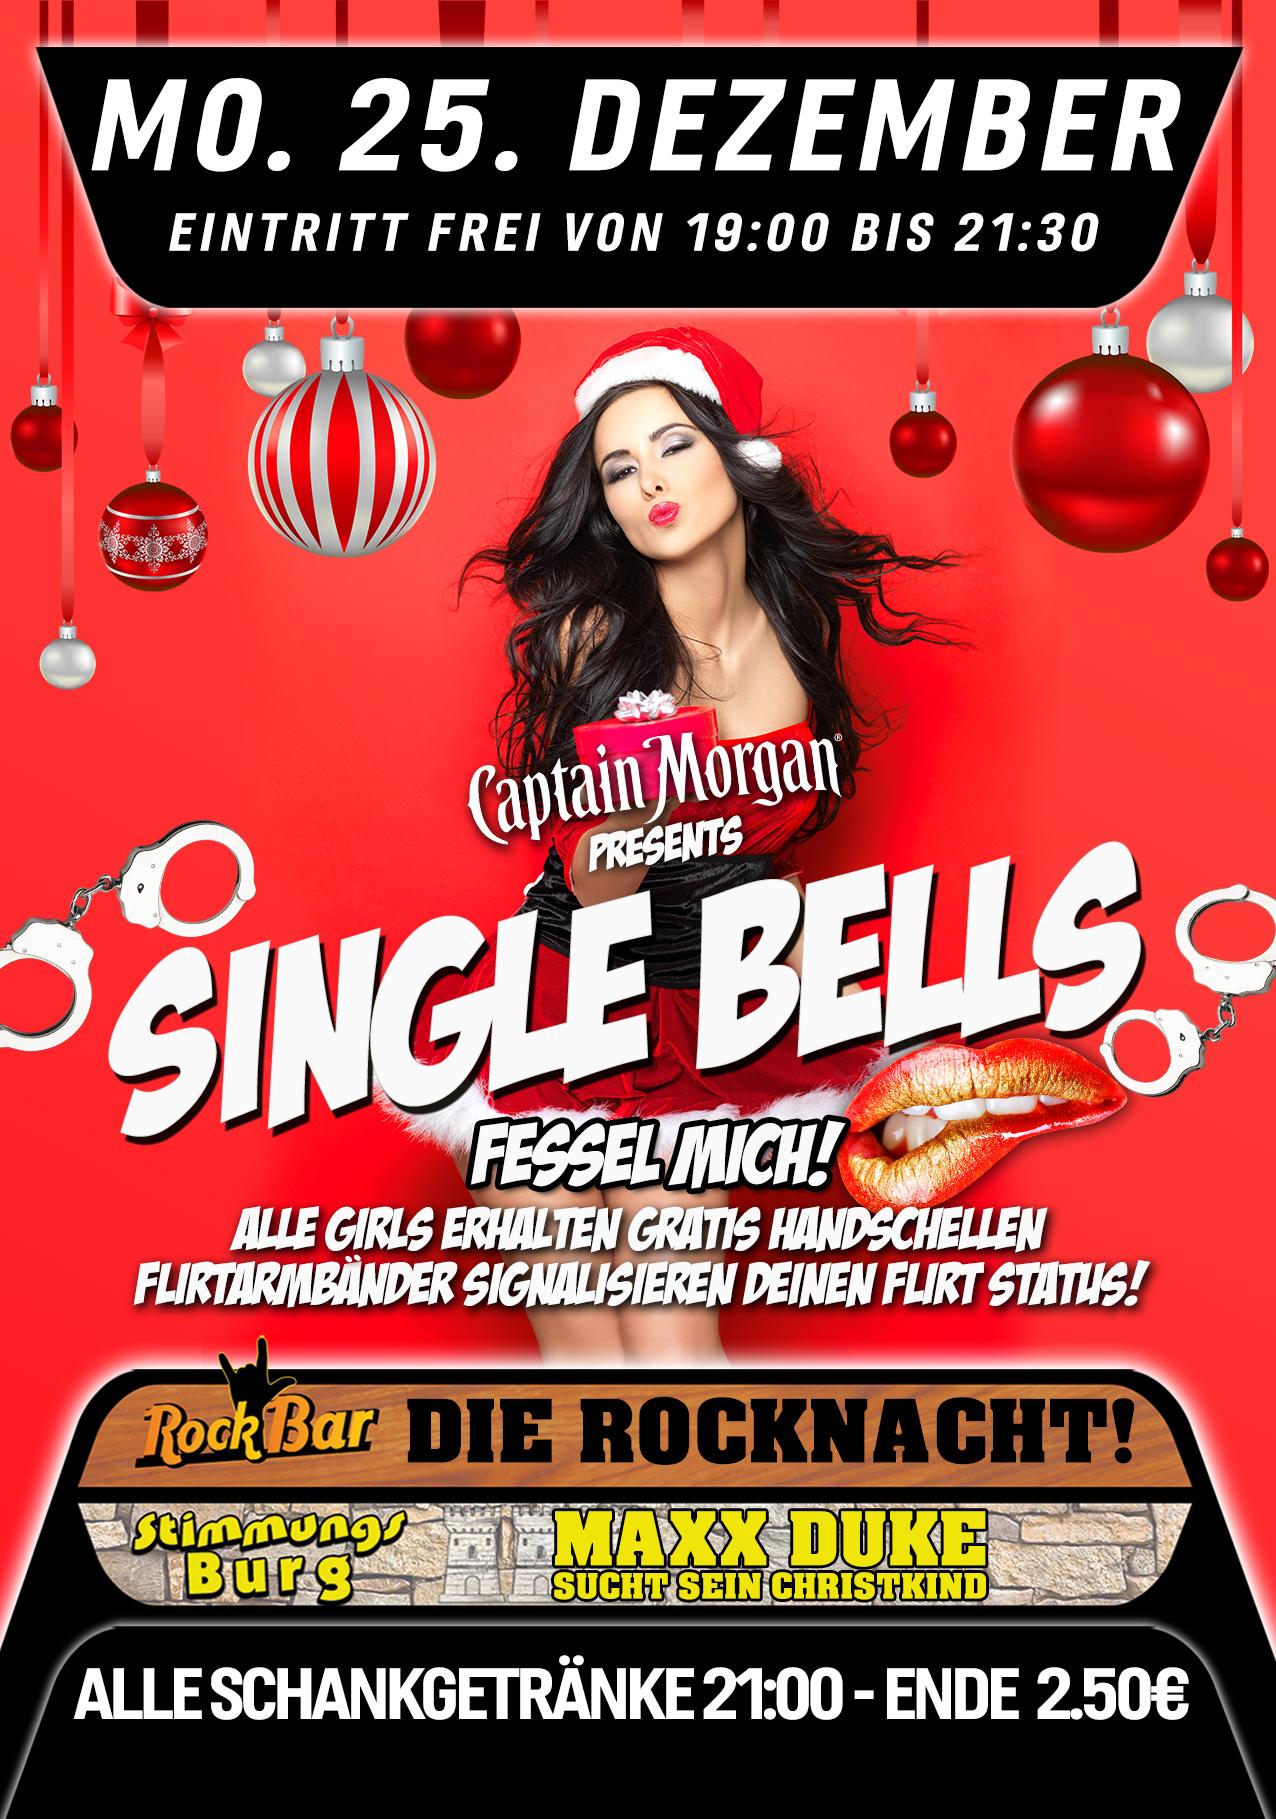 Single Bells - Presented by Captain Morgan